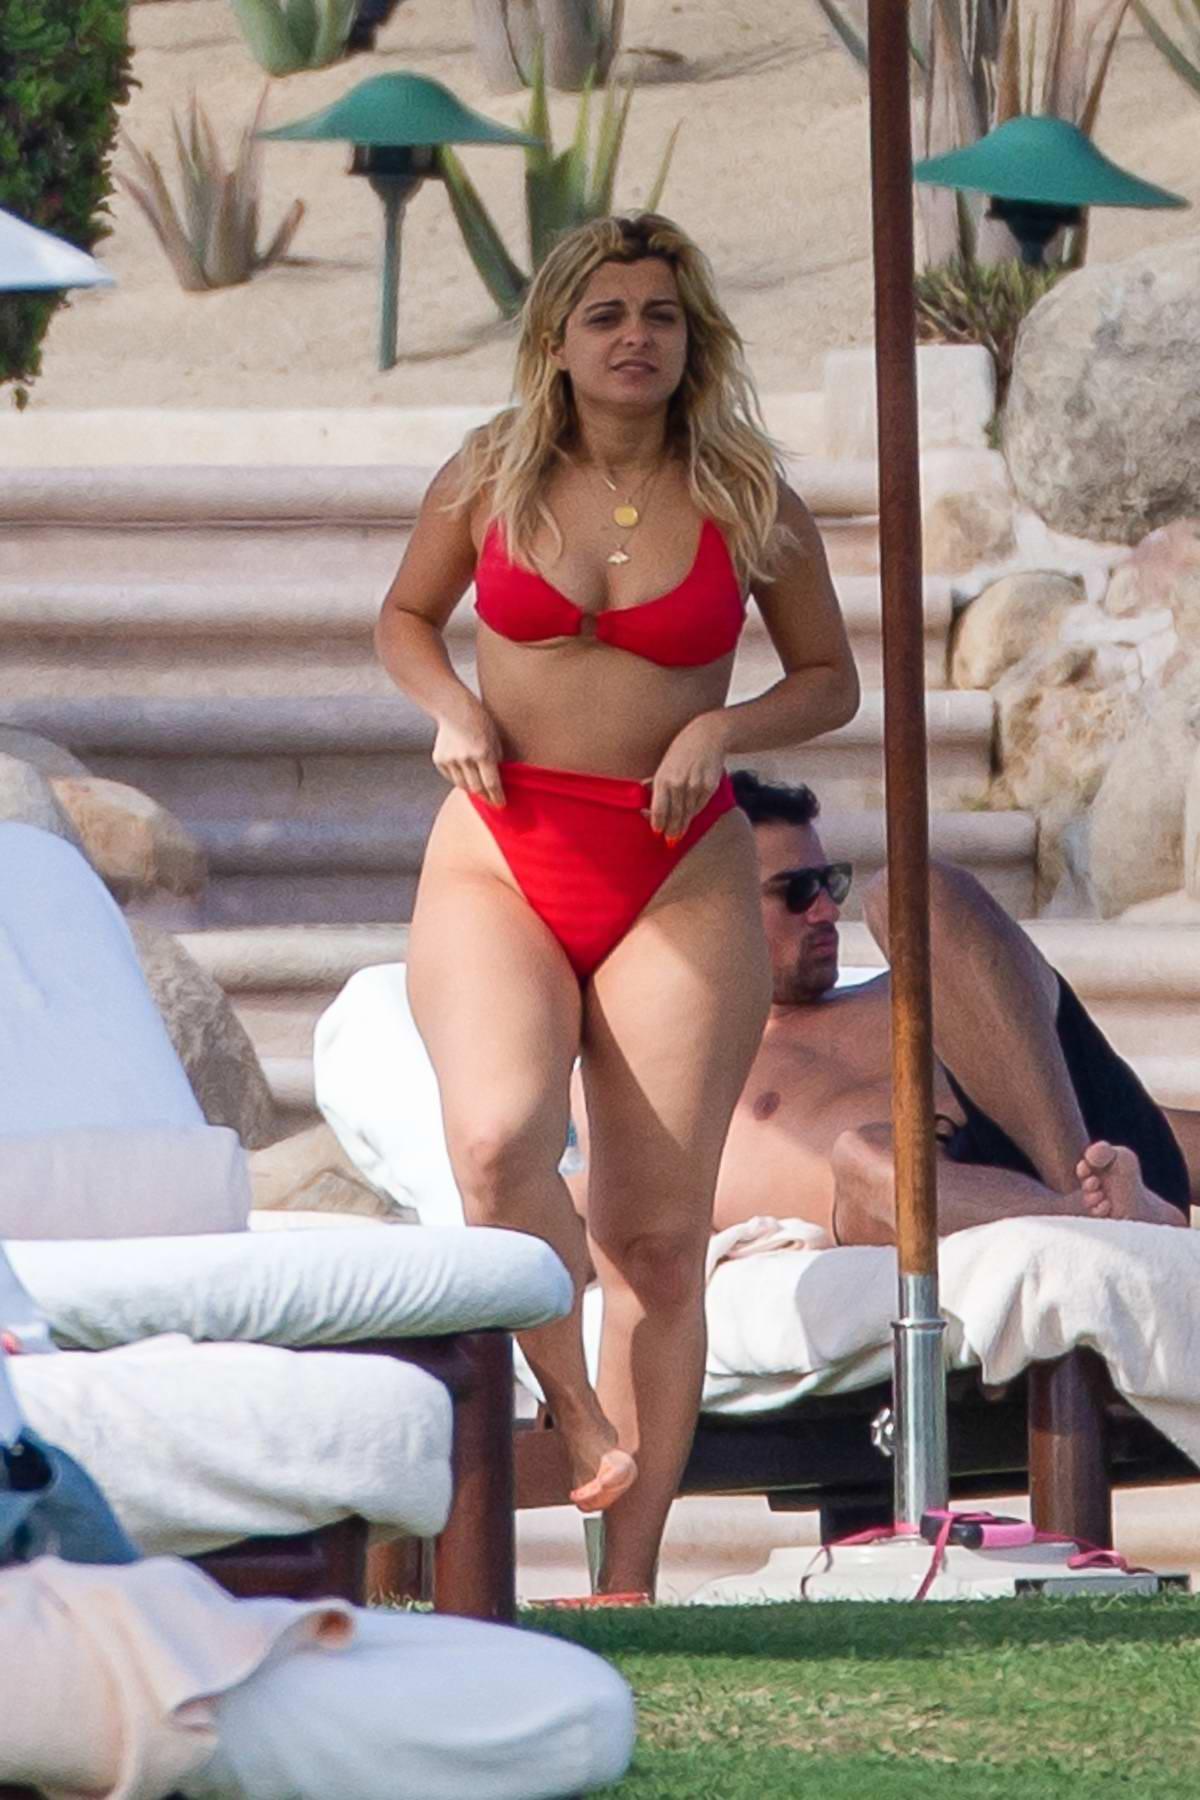 Bebe Rexha looks stunning in a red bikini during a romantic getaway with boyfriend Keyan Safyari in Cabo San Lucas, Mexico